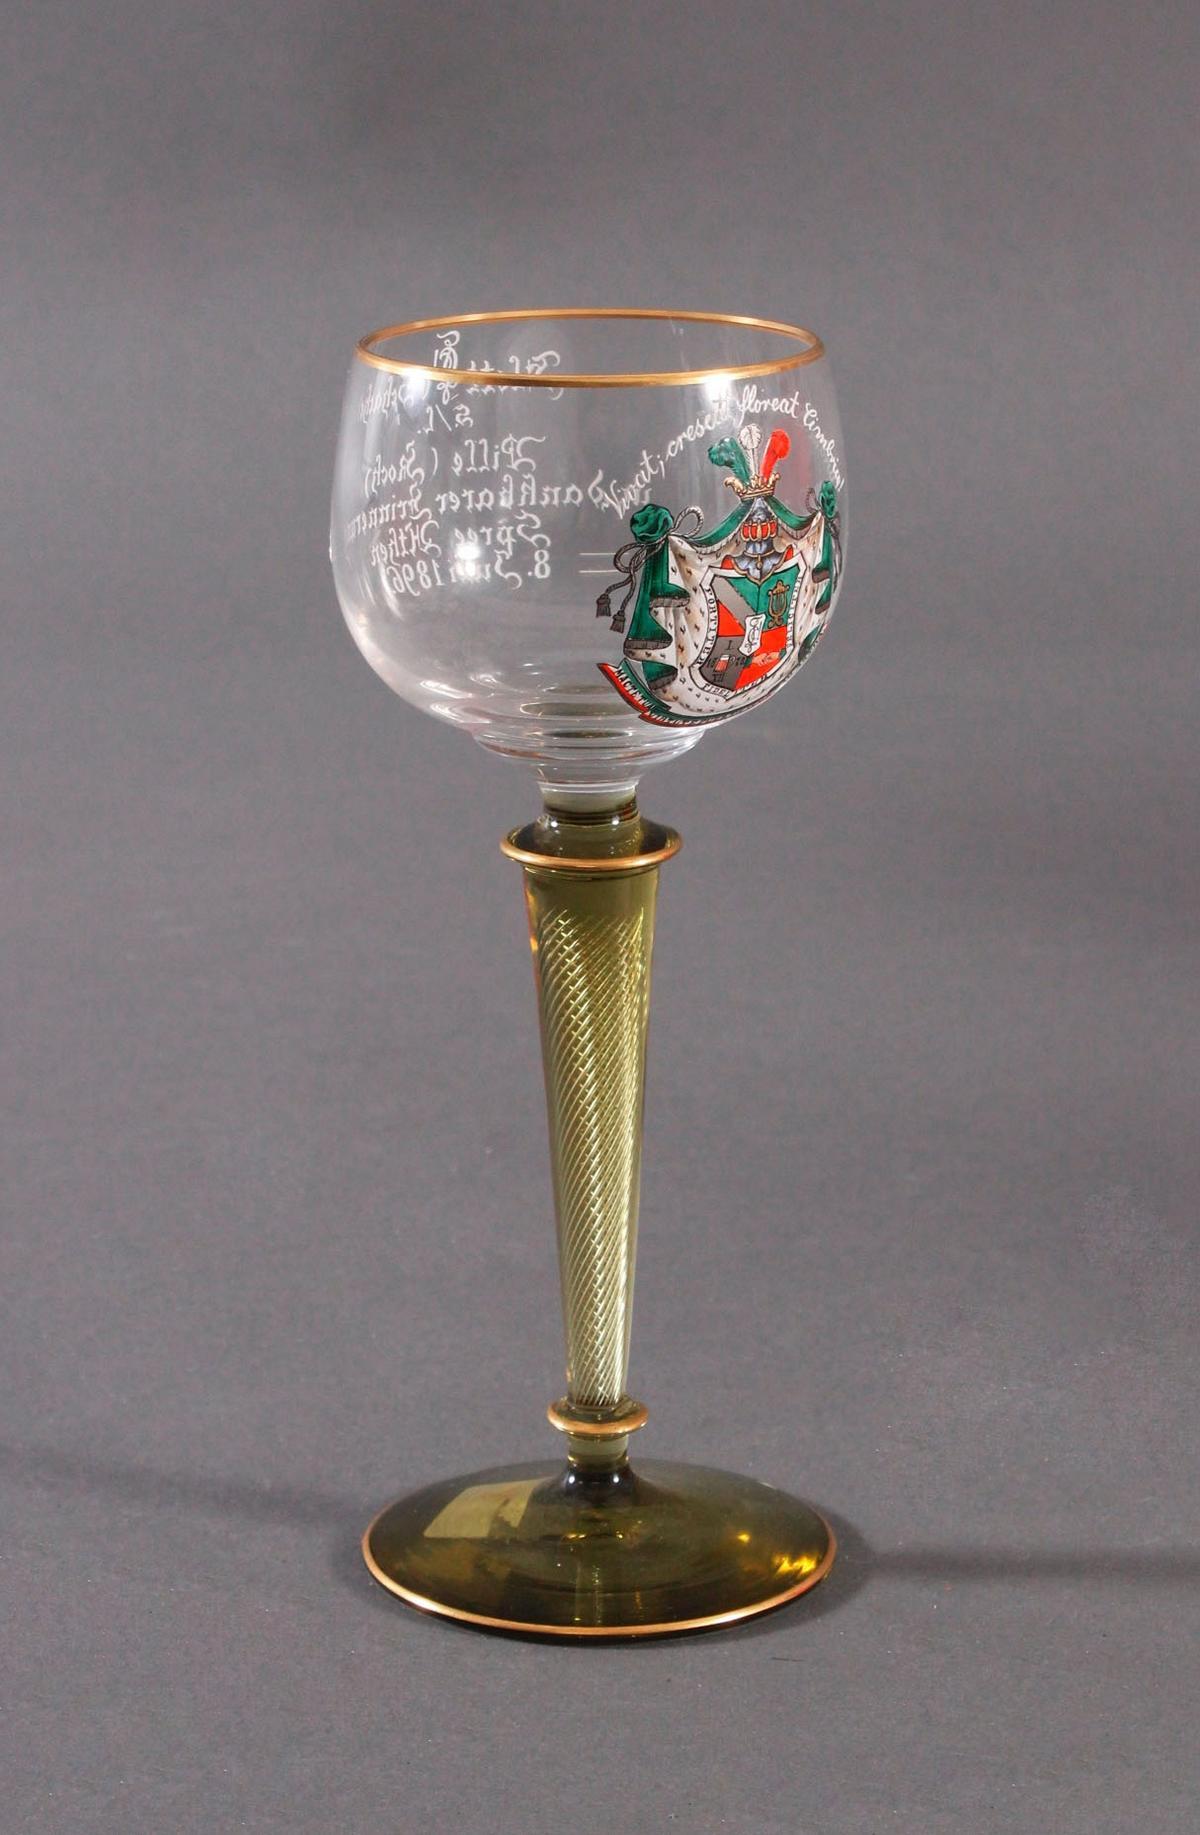 Andenkenglas, Verbindungsglas um 1900-2